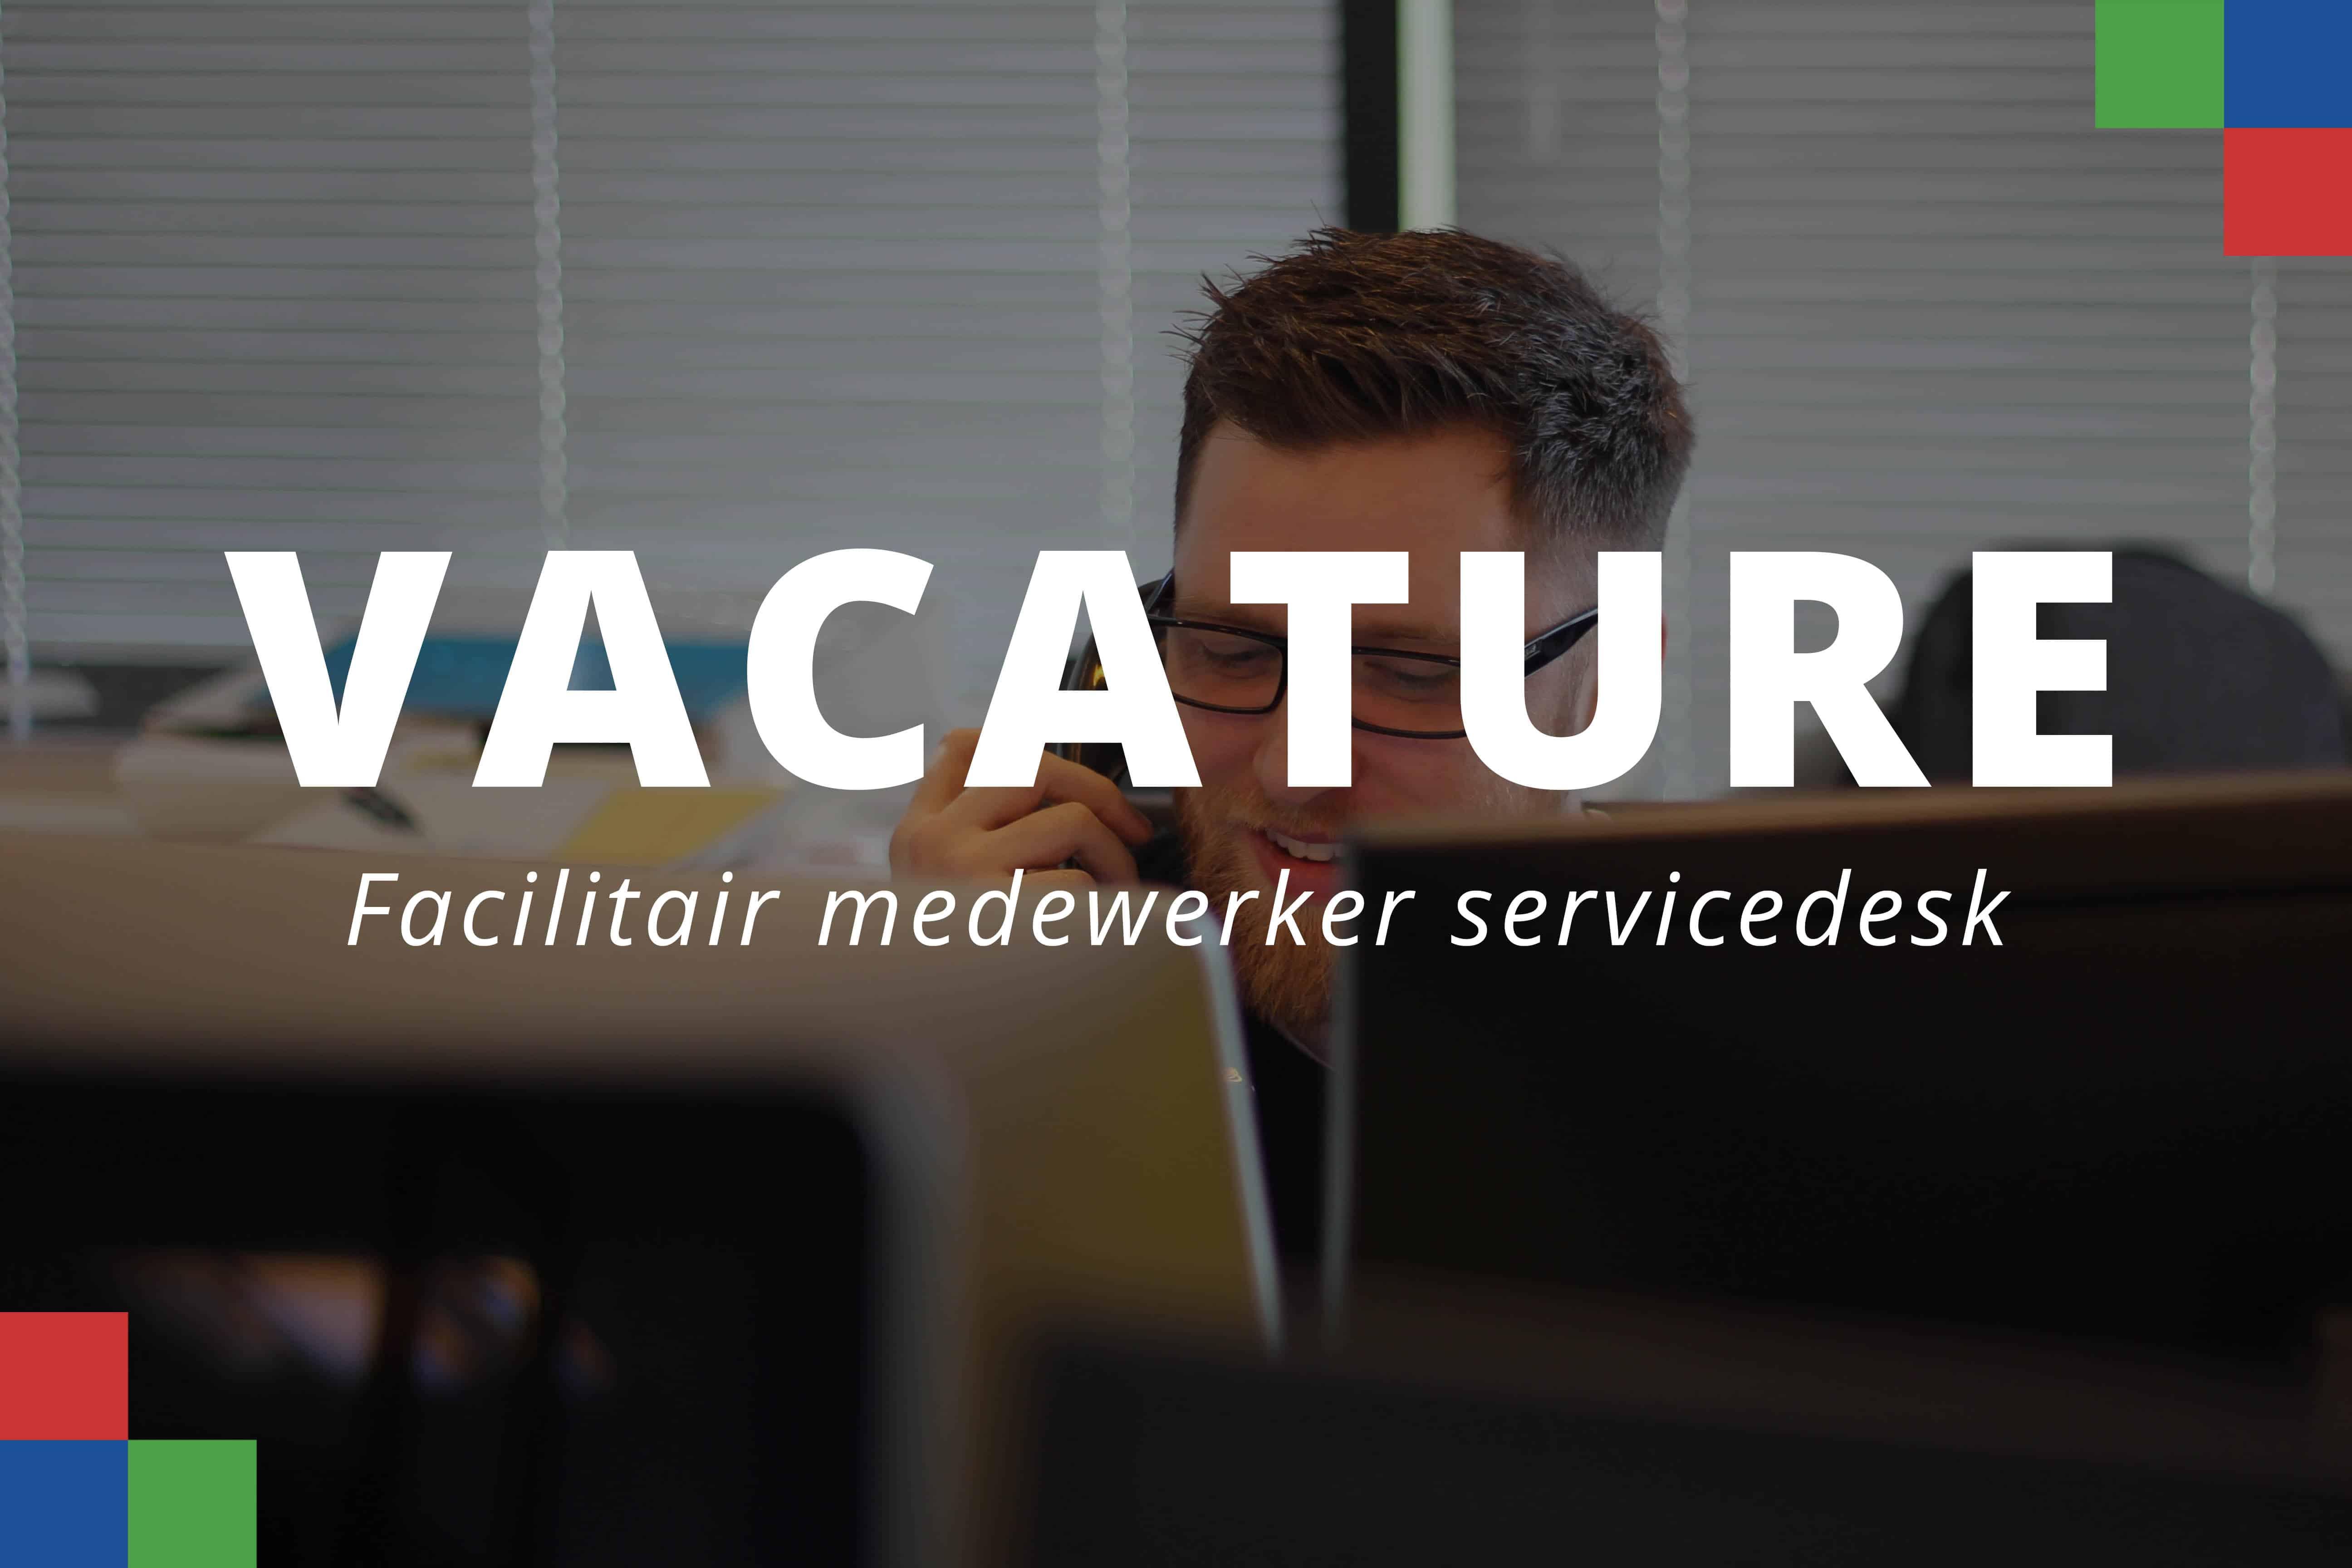 Vacature facilitair medewerker servicedesk